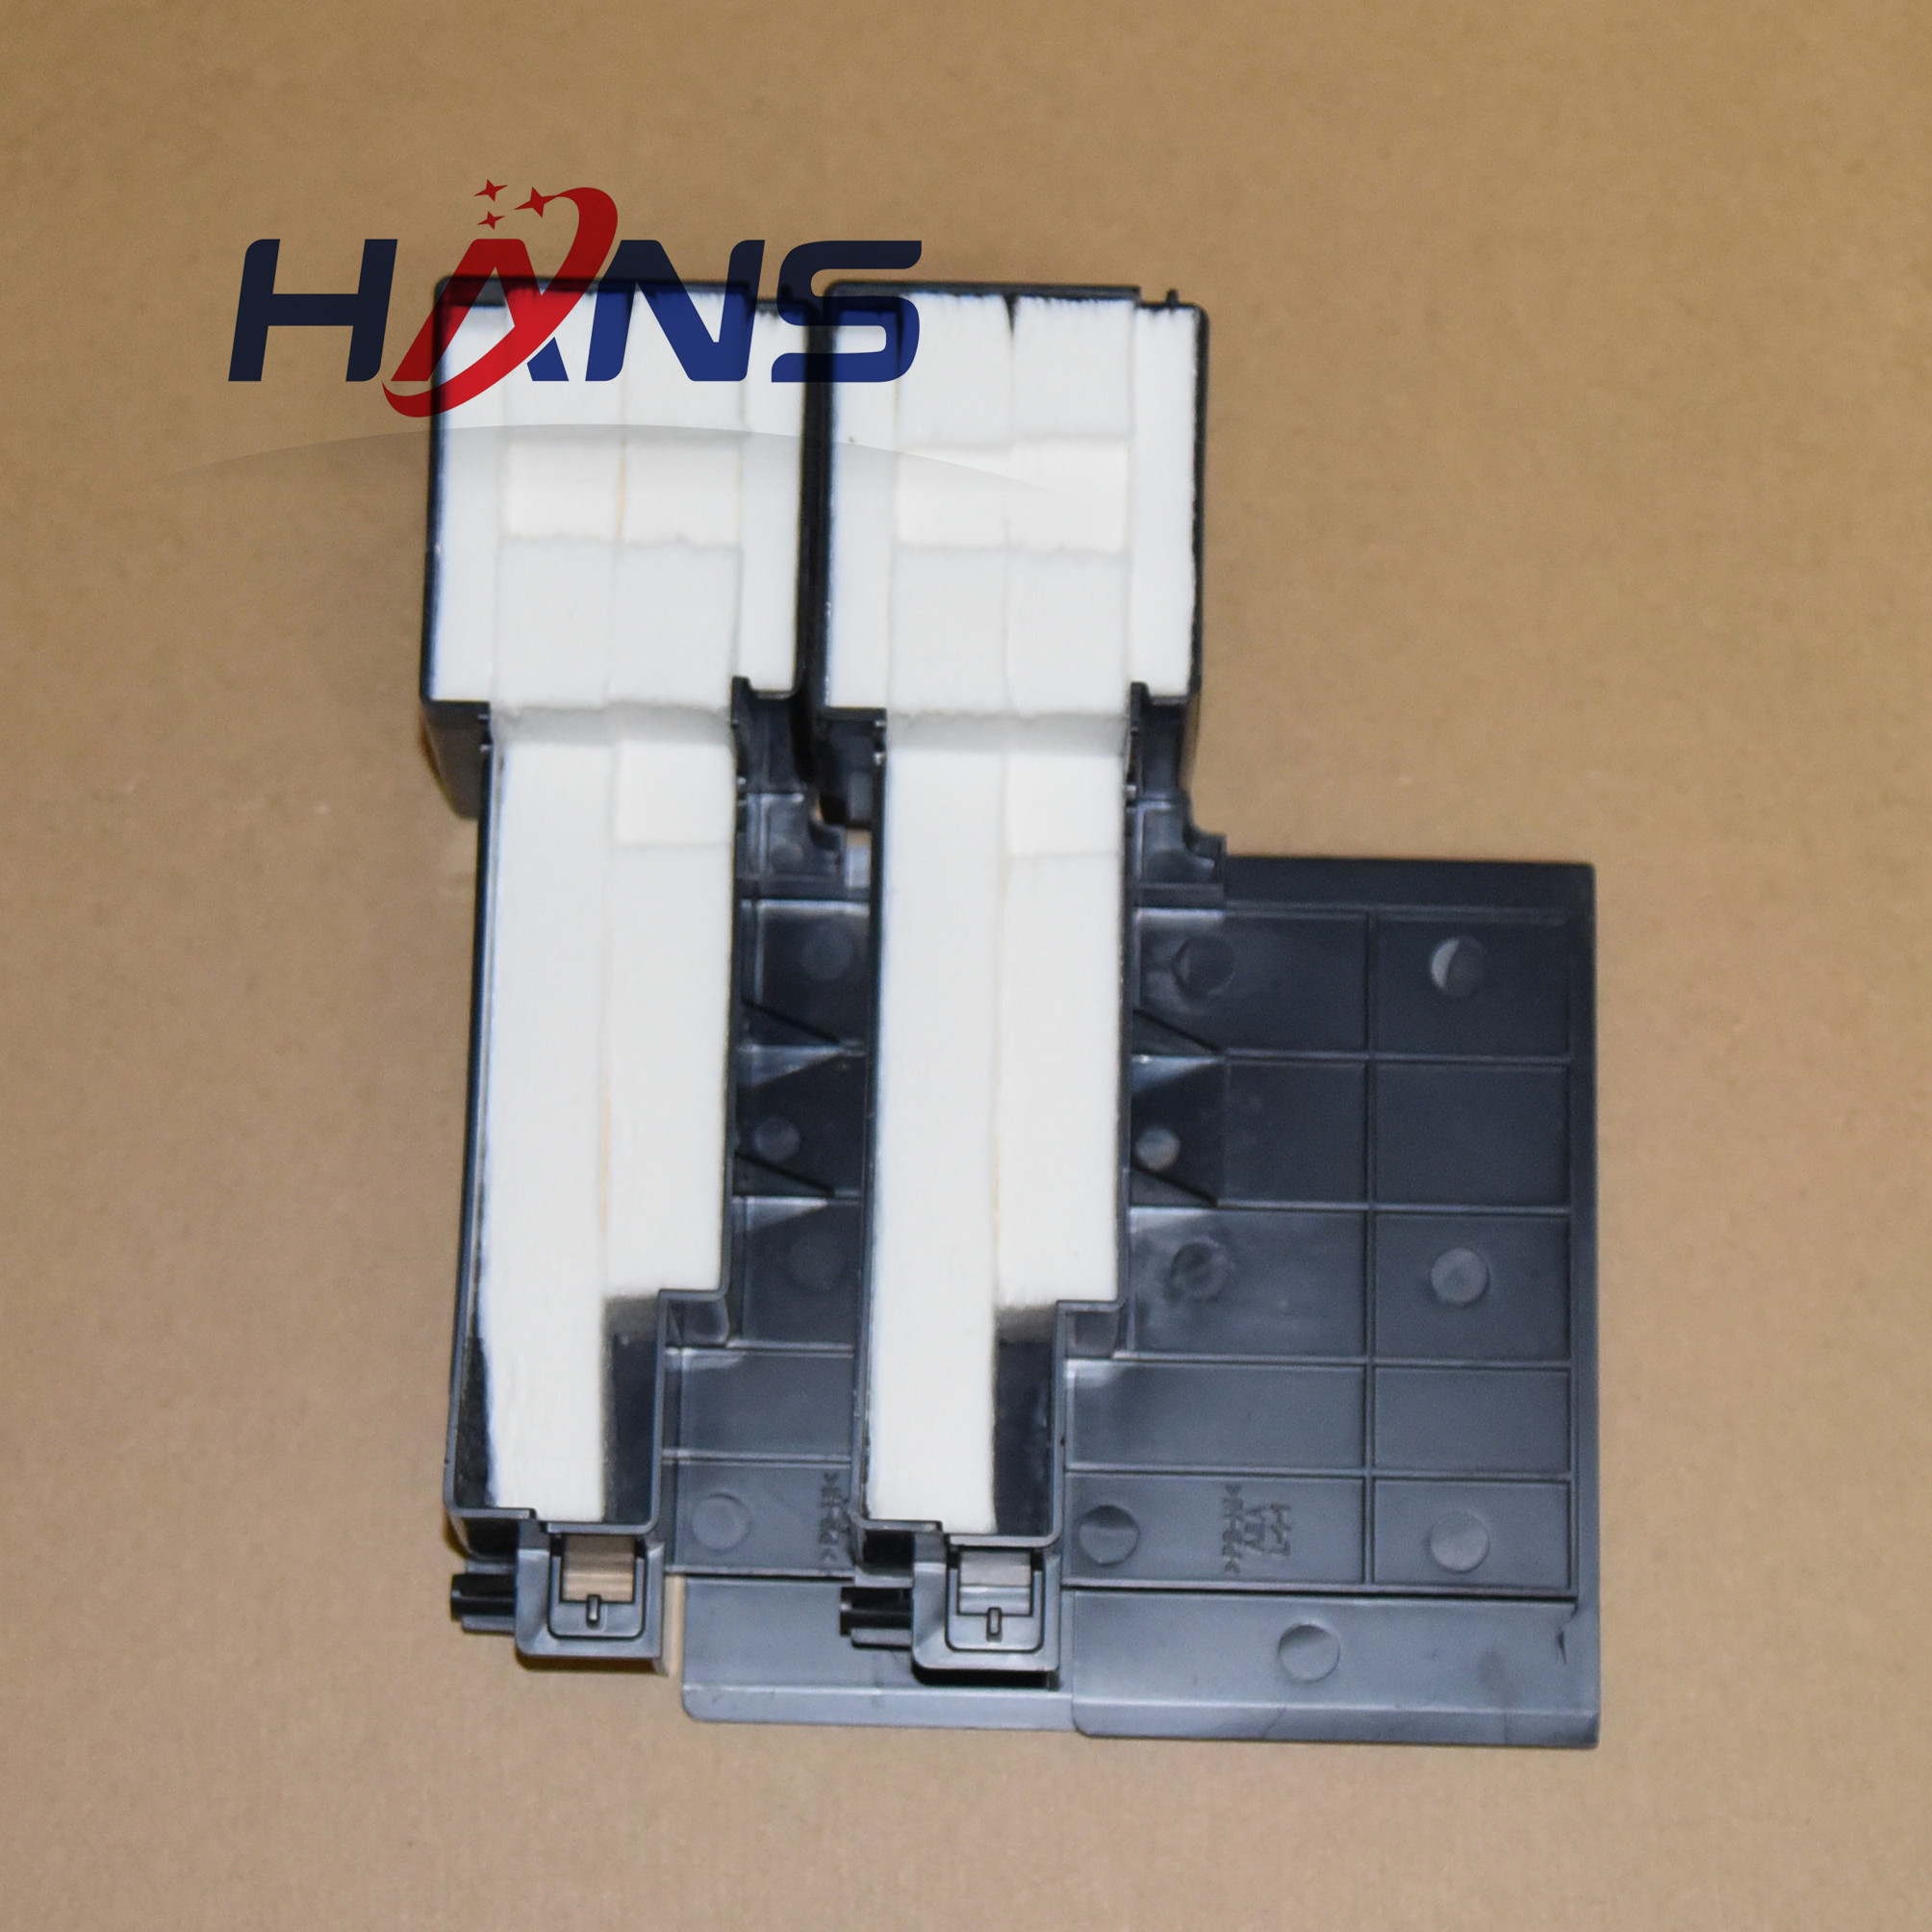 Image 5 - 16PCS Original L301 Waste Ink Tank Pad Sponge for Epson L300 L303 L350 L351 L353 L358 L355 L111 L110 L210 L211 ME101 ME303 ME401-in Printer Parts from Computer & Office